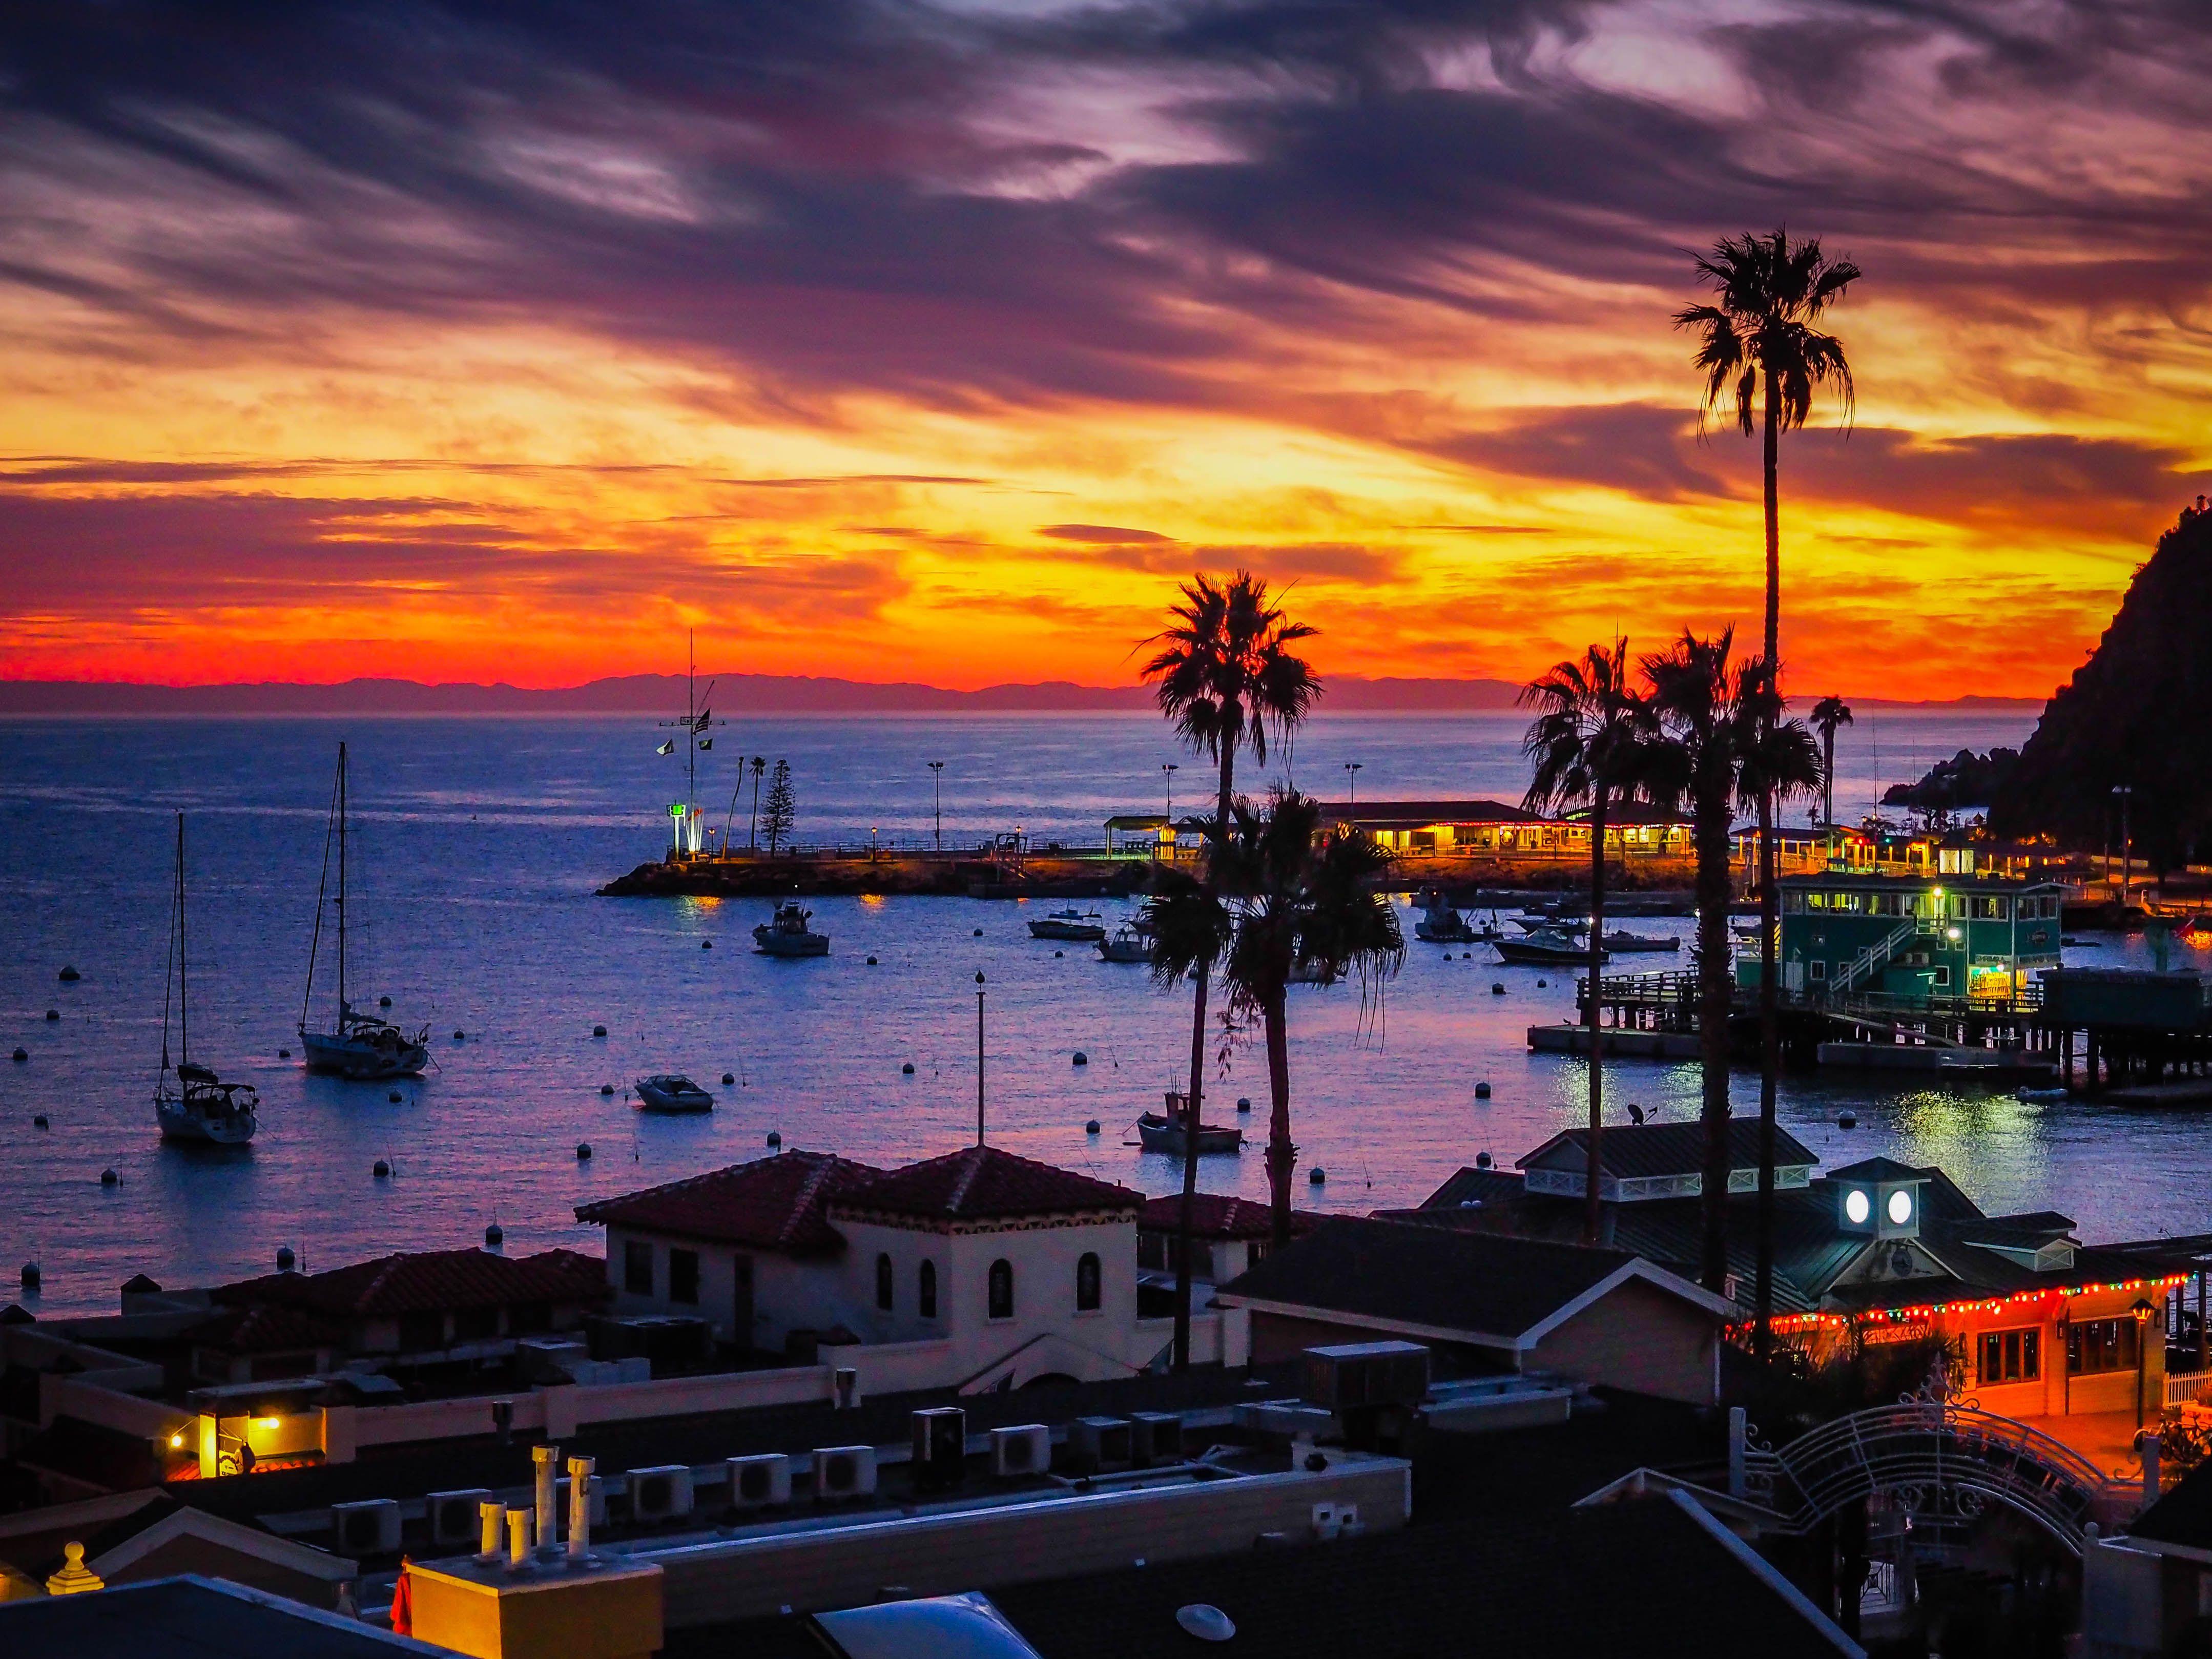 Sunset at Catalina Island CA [4317 x 3238] [OC] [OS